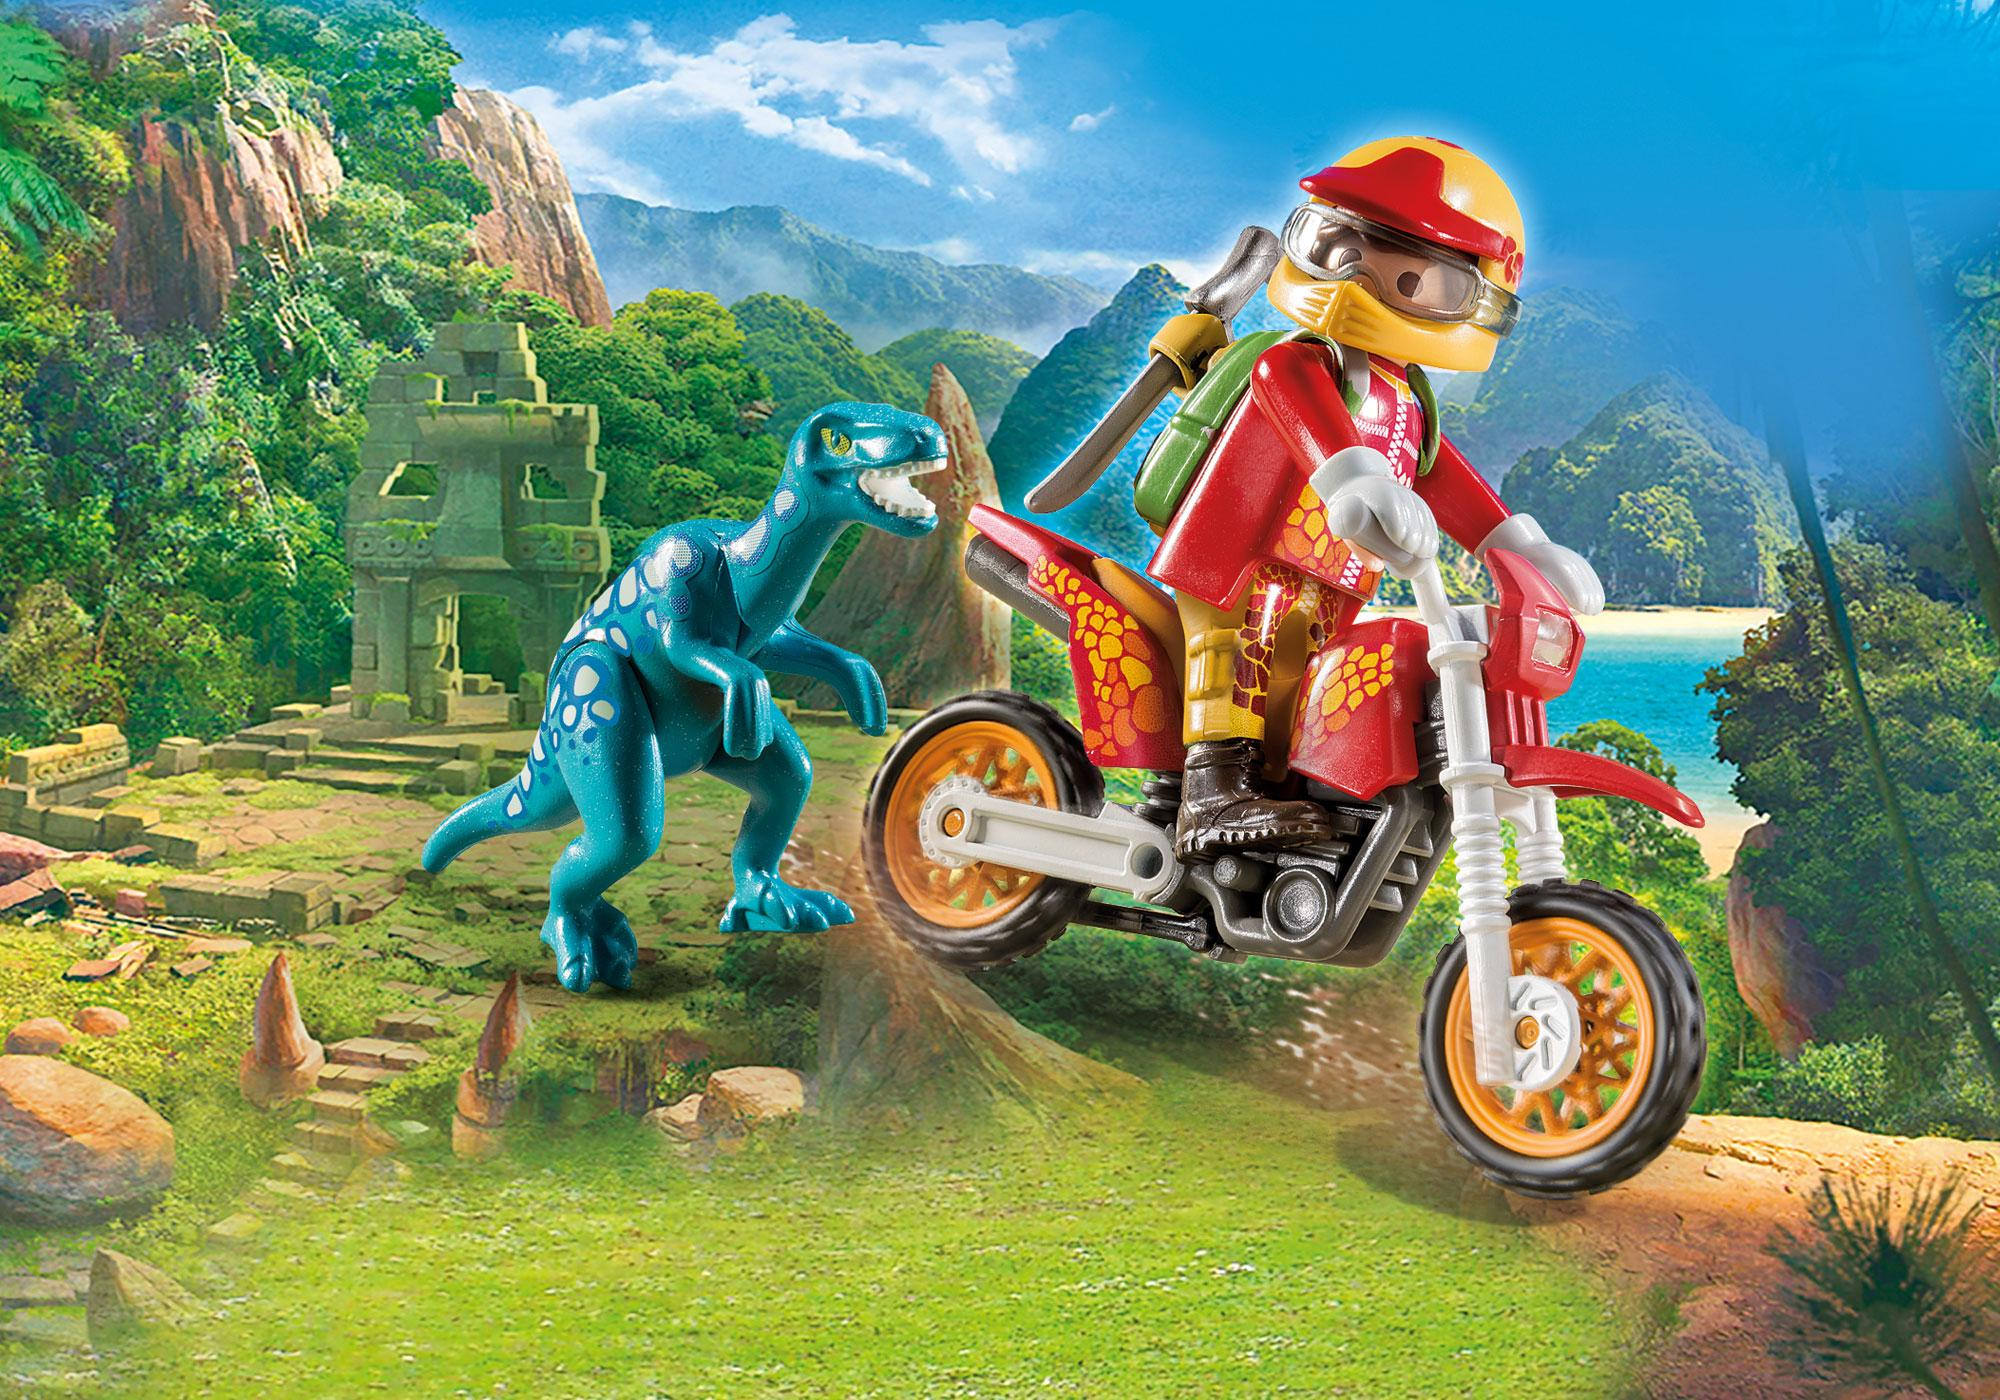 http://media.playmobil.com/i/playmobil/9431_product_detail/Motocrosscykel med raptor